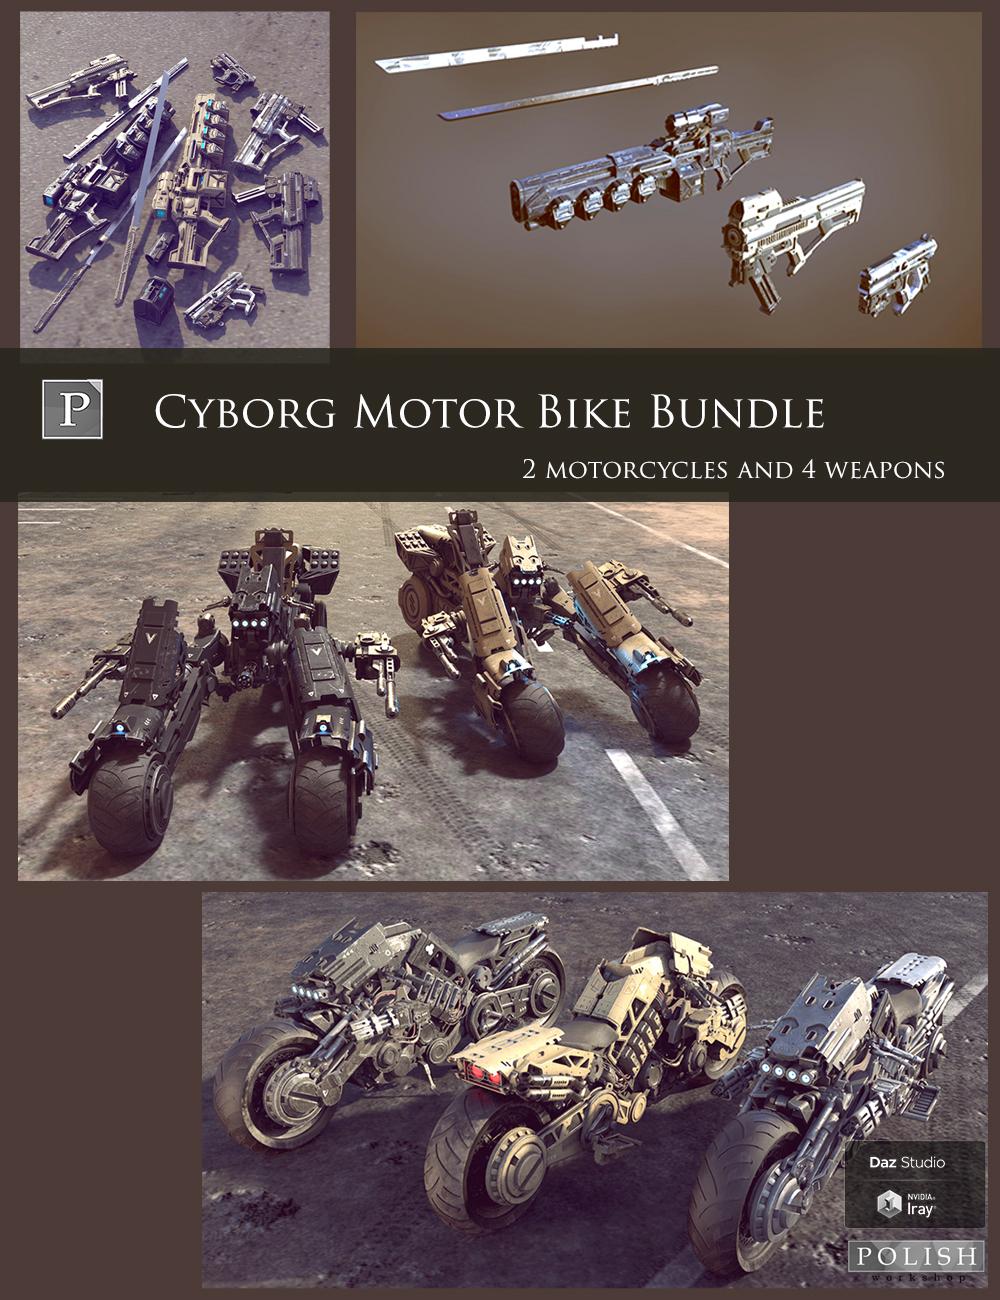 Cyborg Motor Bike Bundle by: Polish, 3D Models by Daz 3D